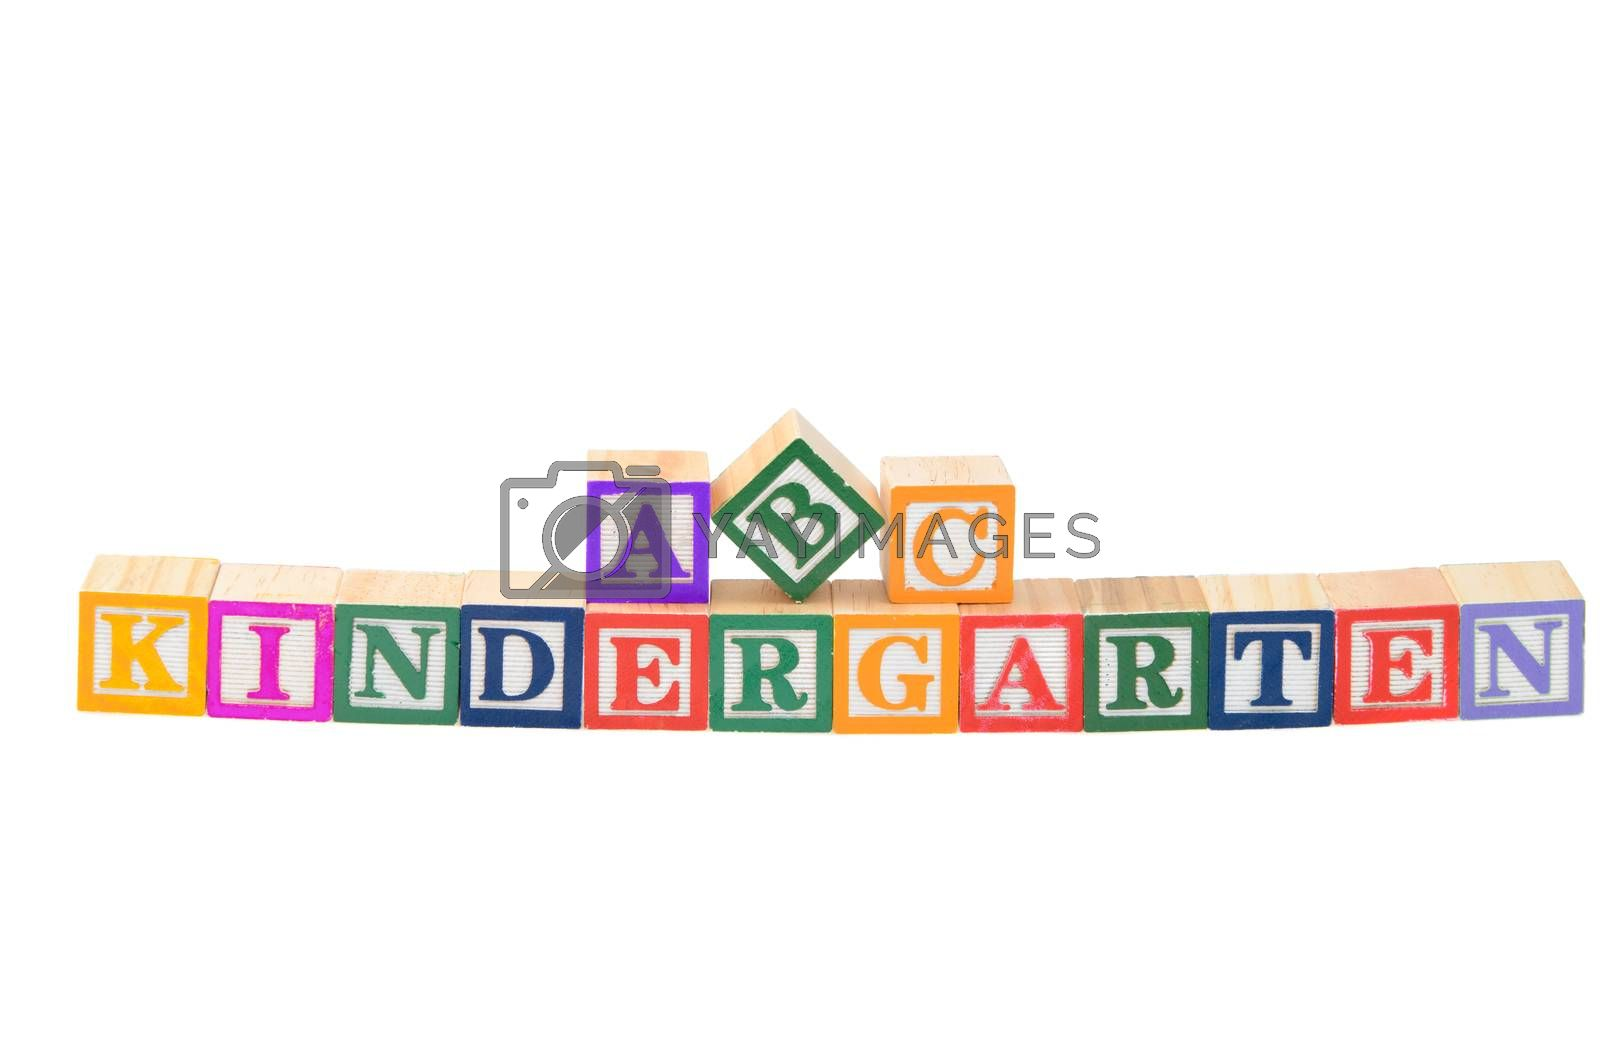 Baby blocks spelling kindergarten. Isolated on a white background.